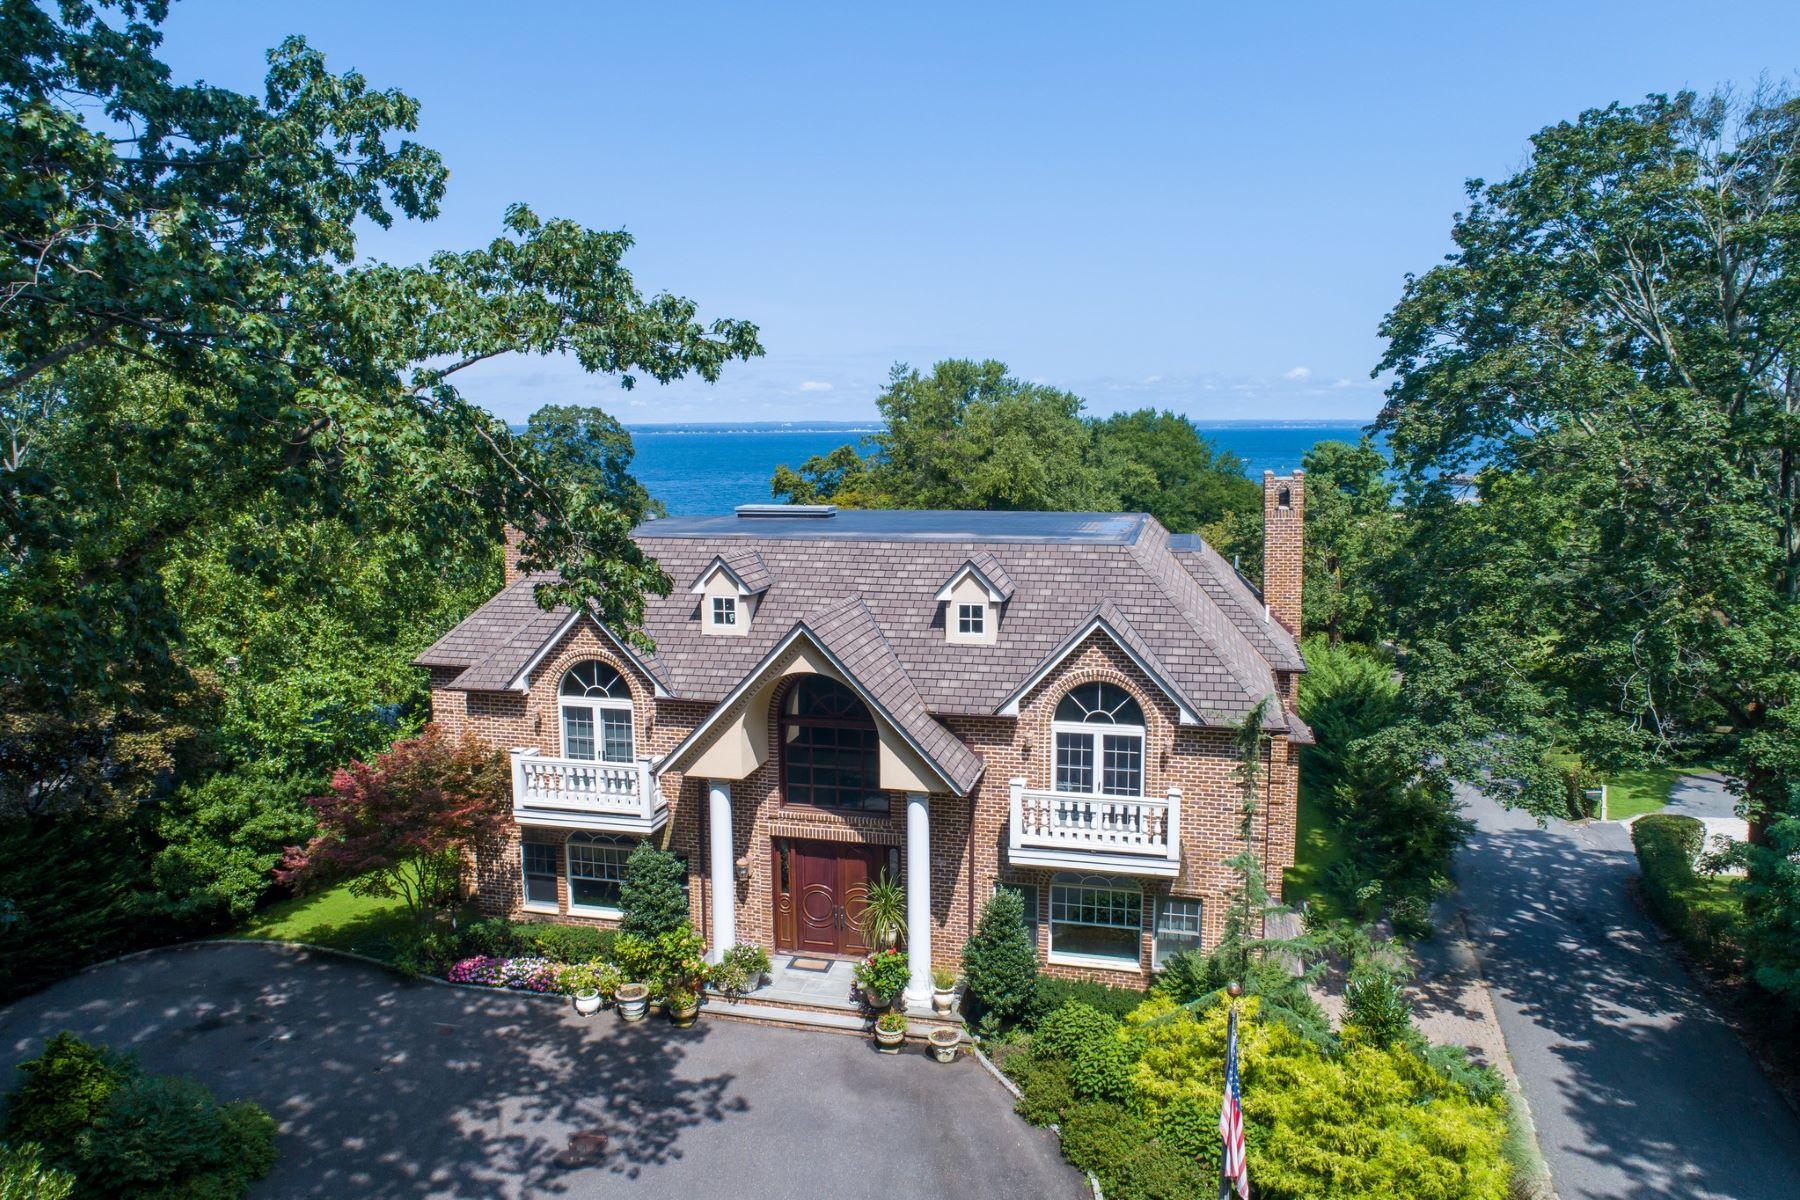 Single Family Homes for Sale at Glen Cove 21 Ridge Rd Glen Cove, New York 11542 United States